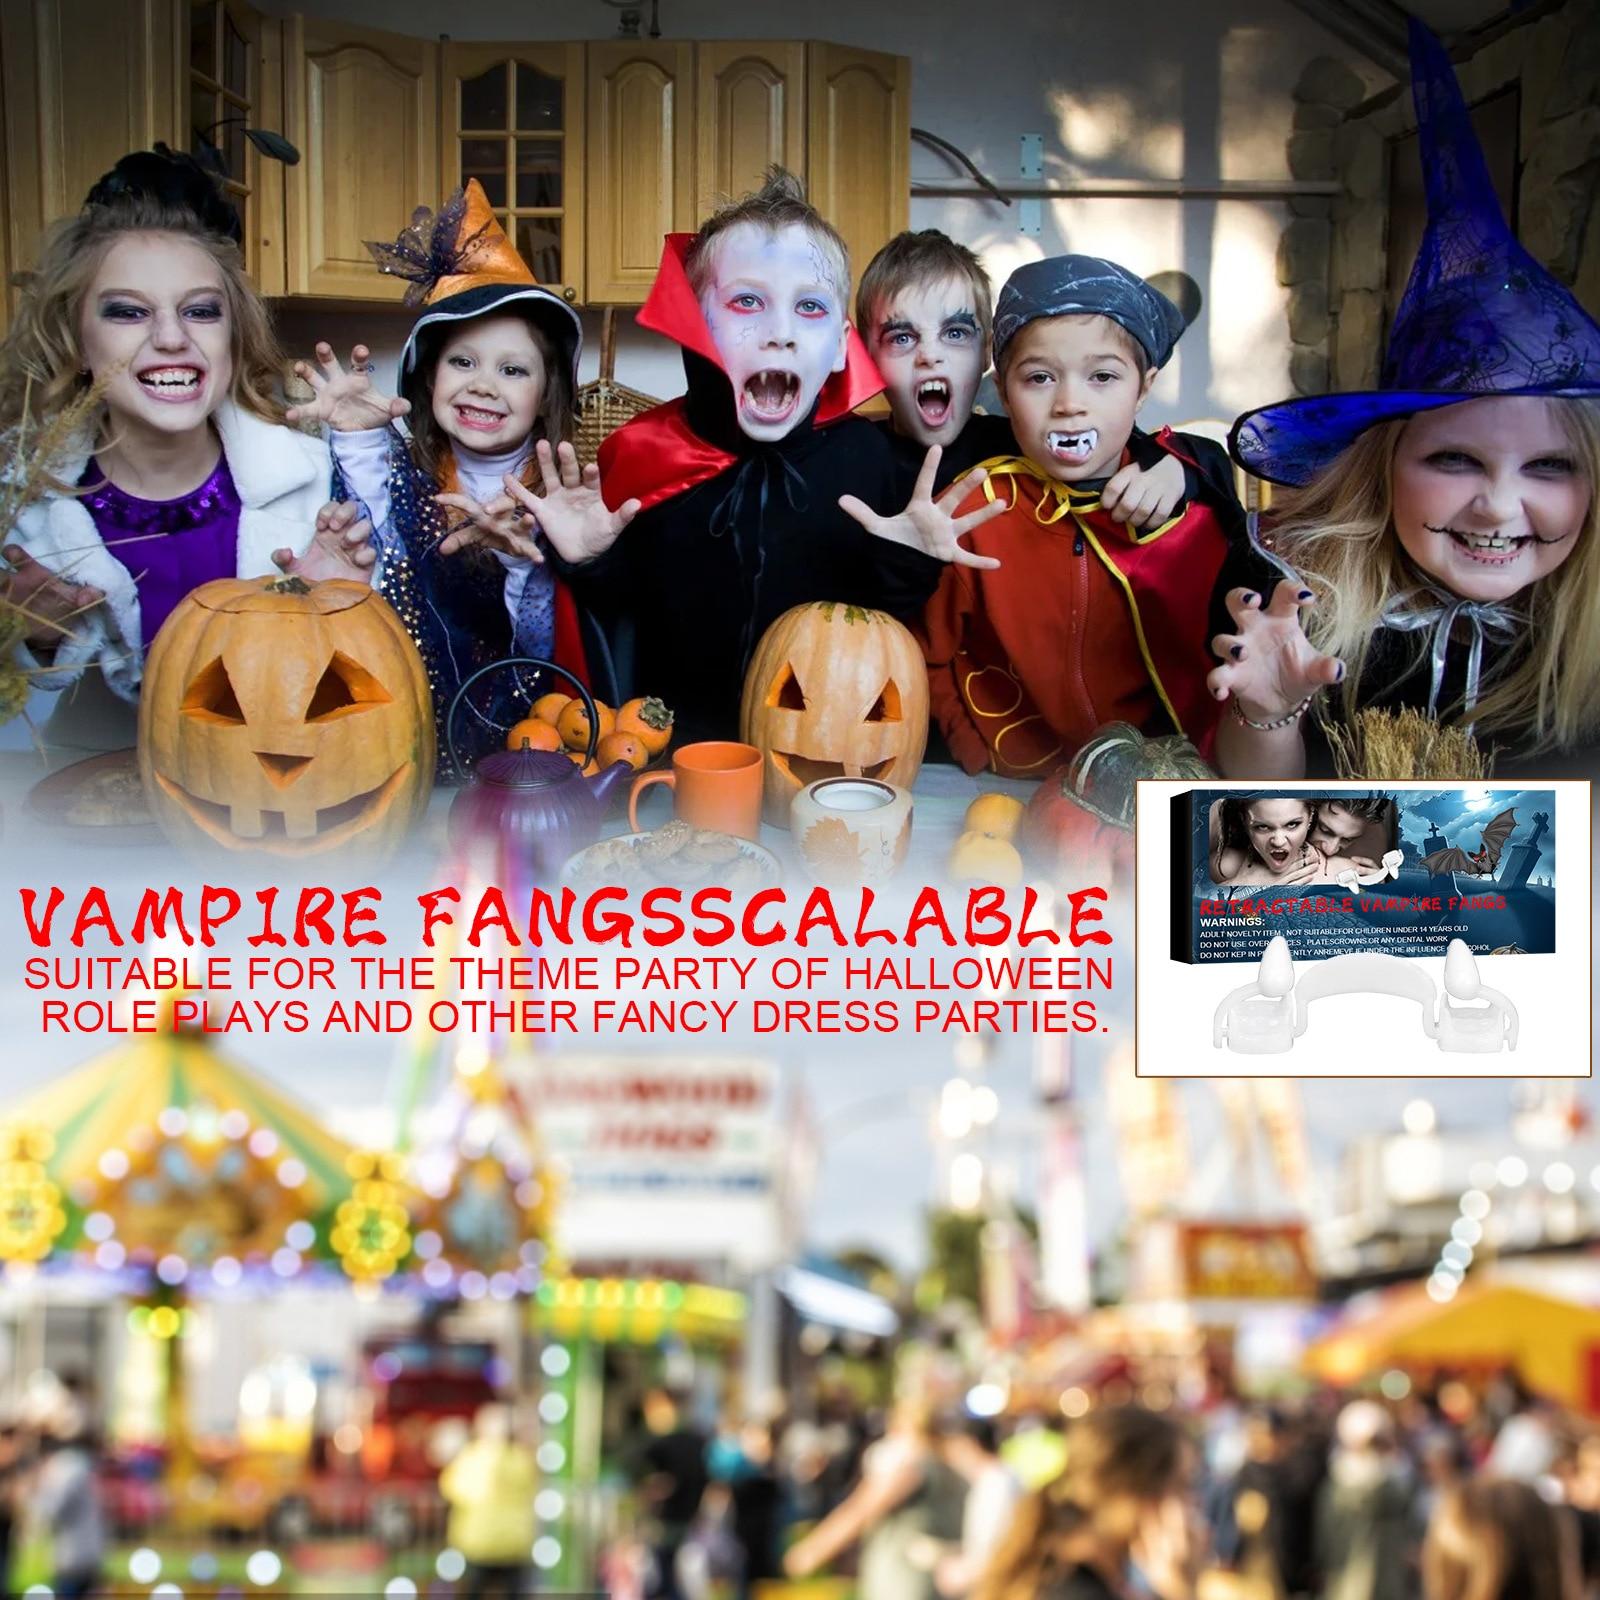 Halloween Teeth Decor Vampire Dentures Zombie Teeth Soft Silicone Horror Denture Prop Retractable Easy Mount Cosplay Props Decor